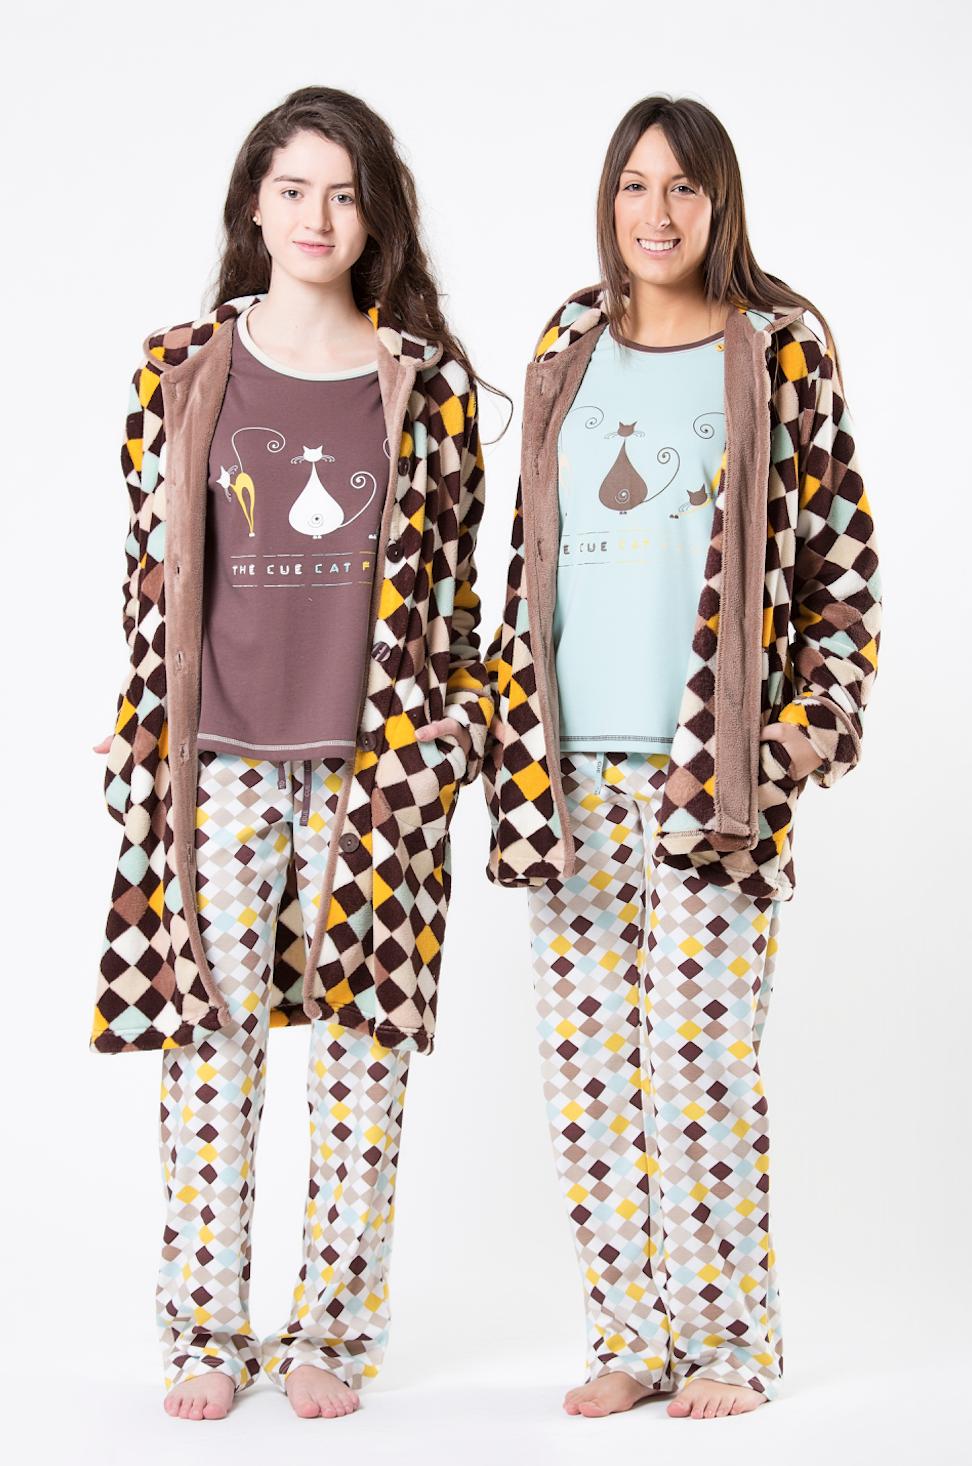 a019b99711ac8 pijama mujer chica Cue moda noche woman fashion